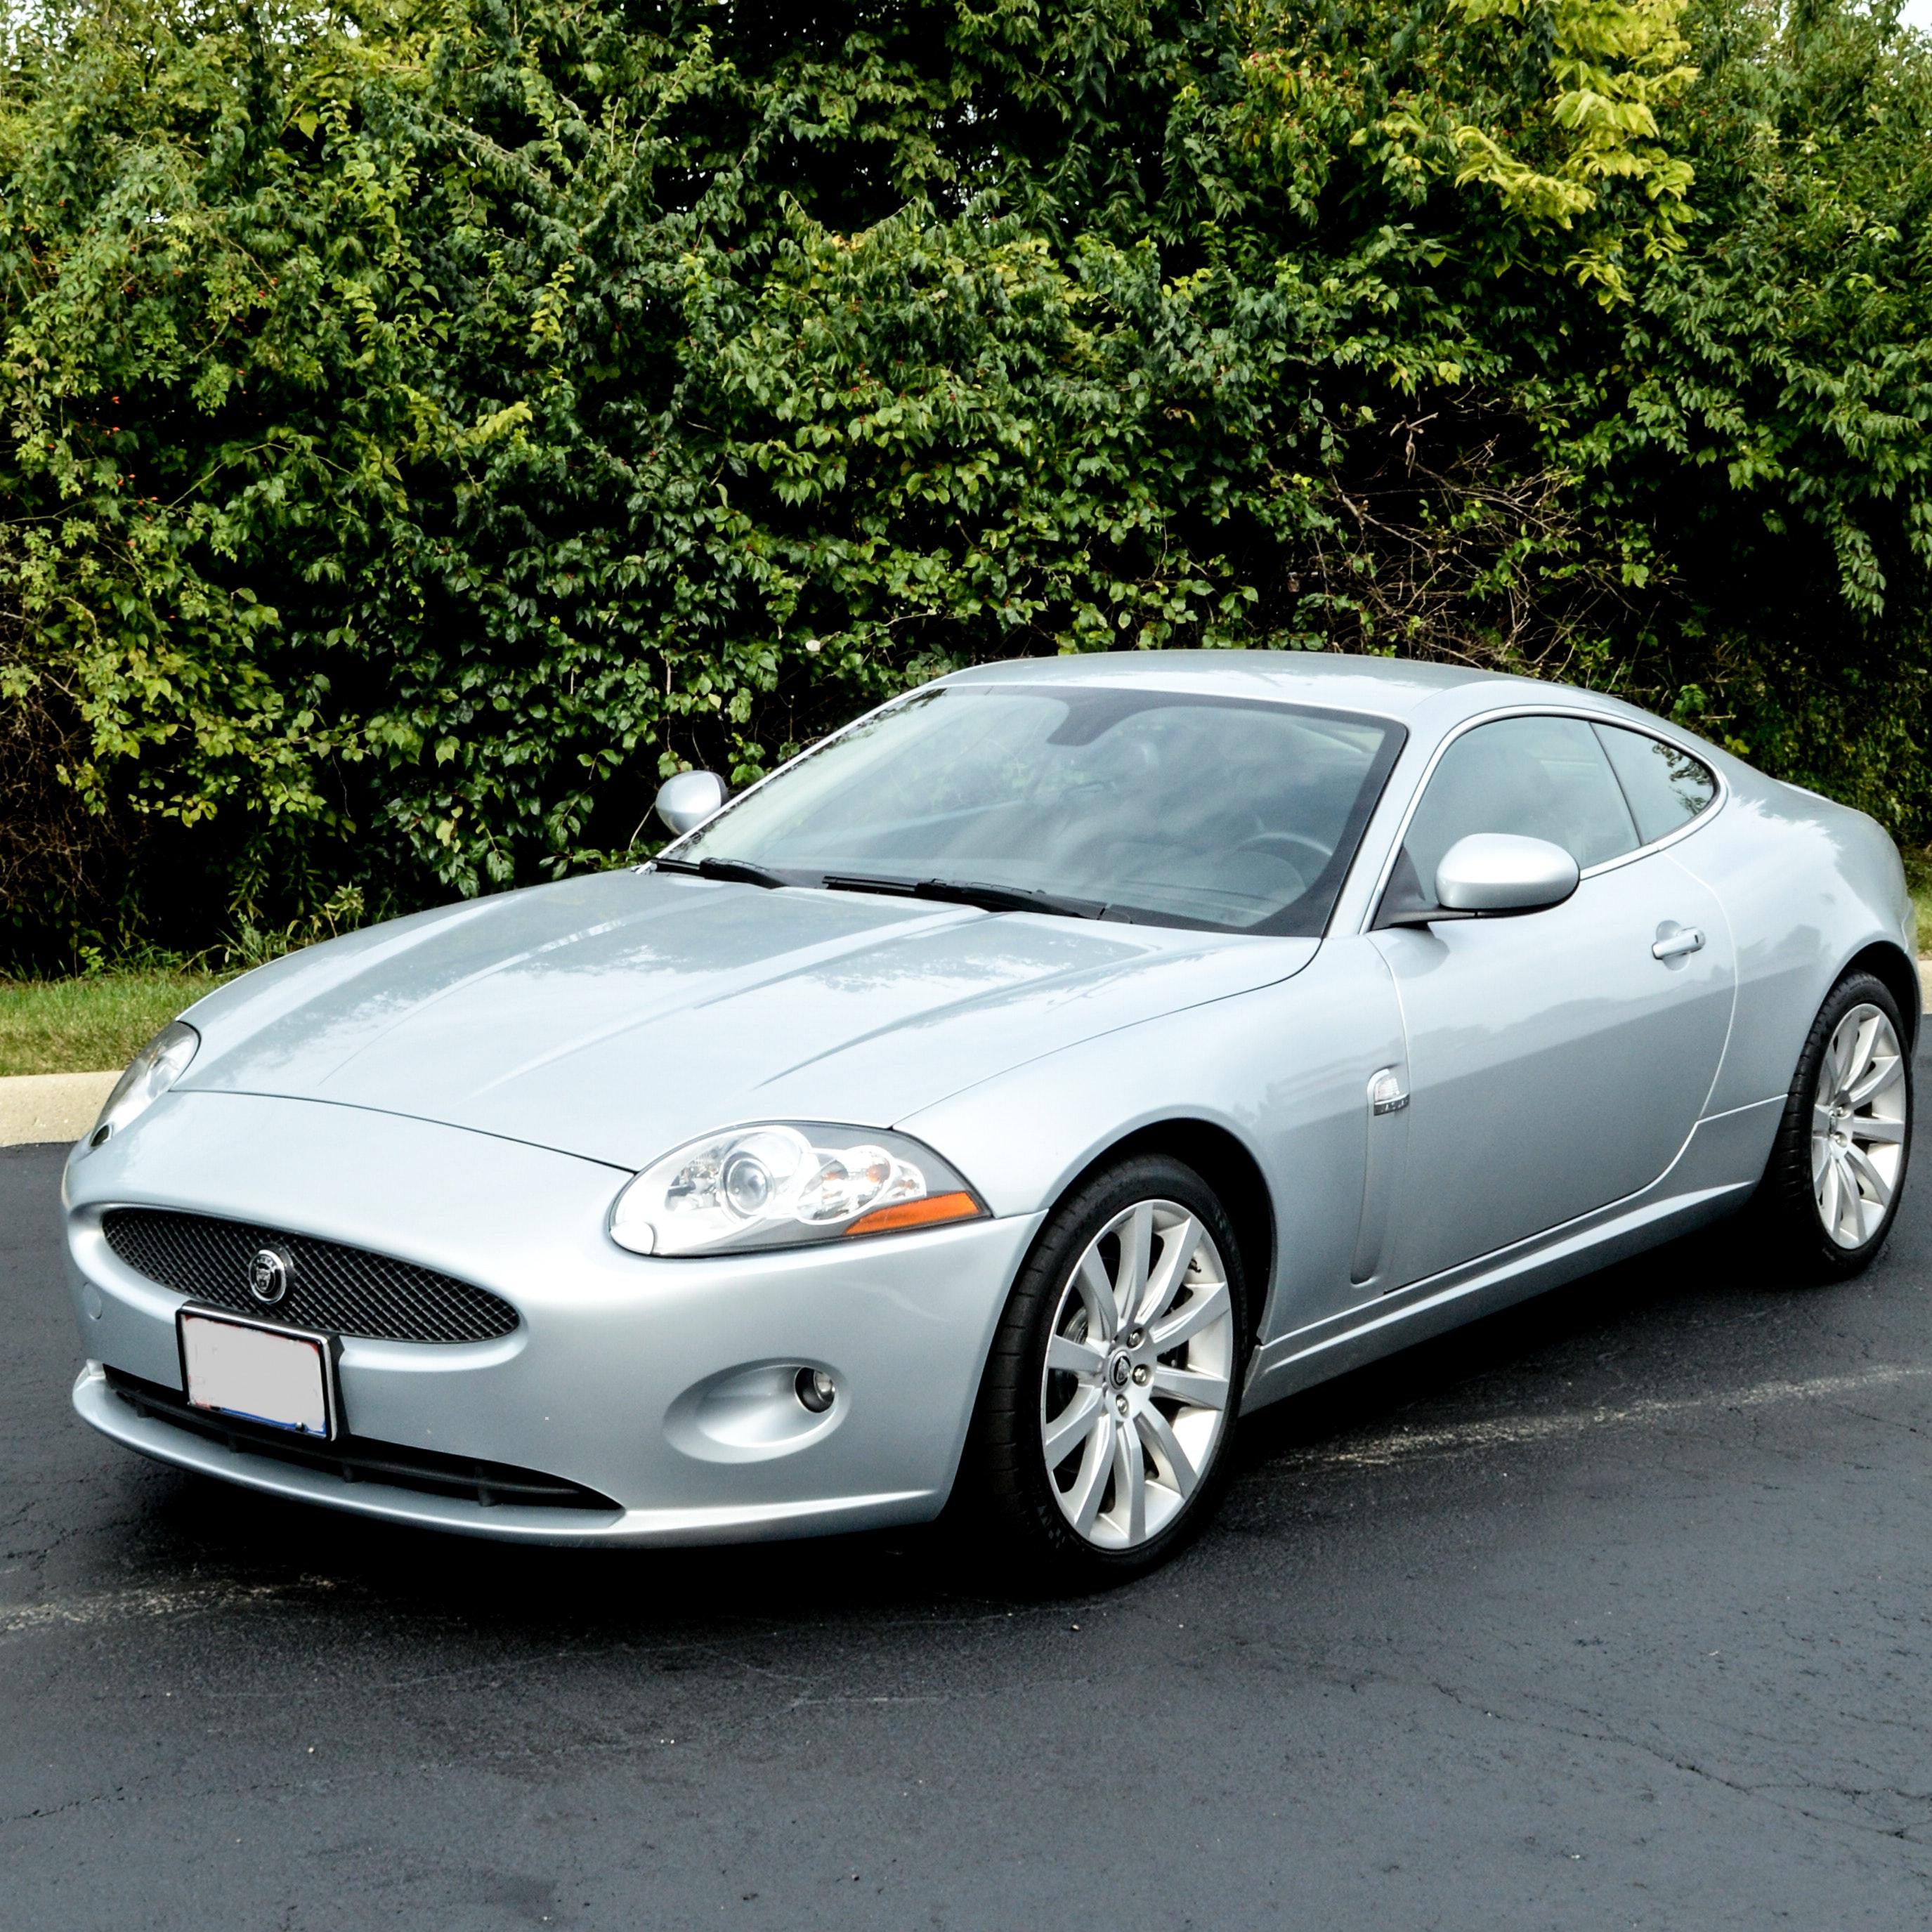 2008 Jaguar XK Luxury Coupe